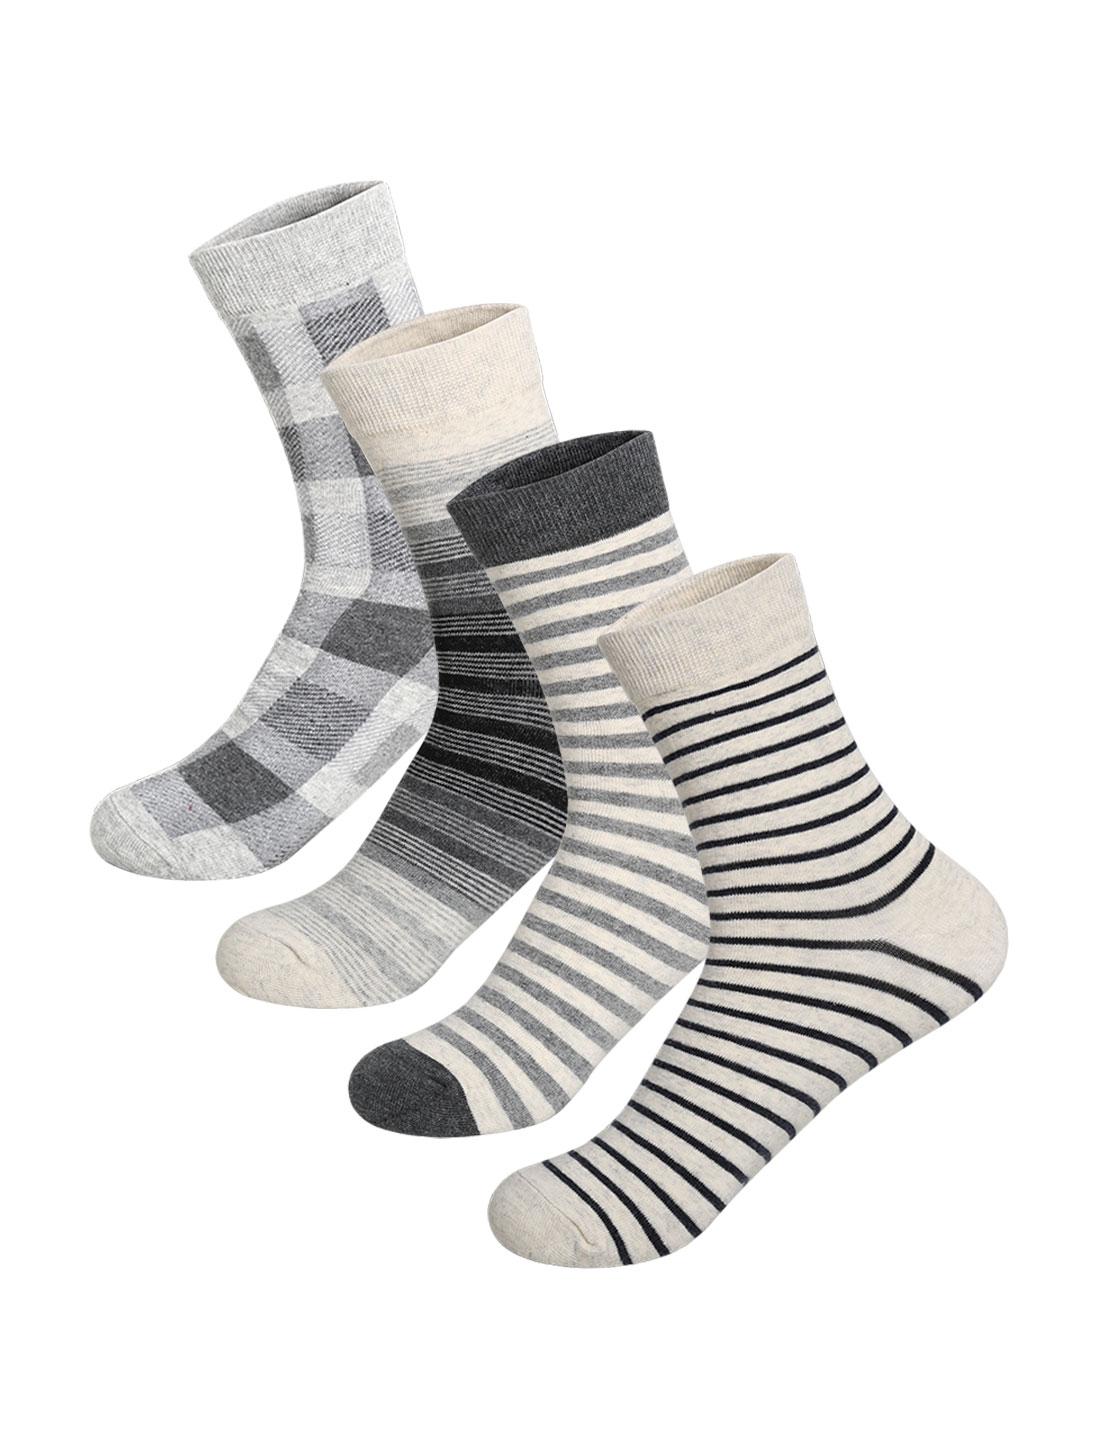 Men 4 pair Stripes Plaids Pattern Crew Socks 10-12 Assorted-Light Gray